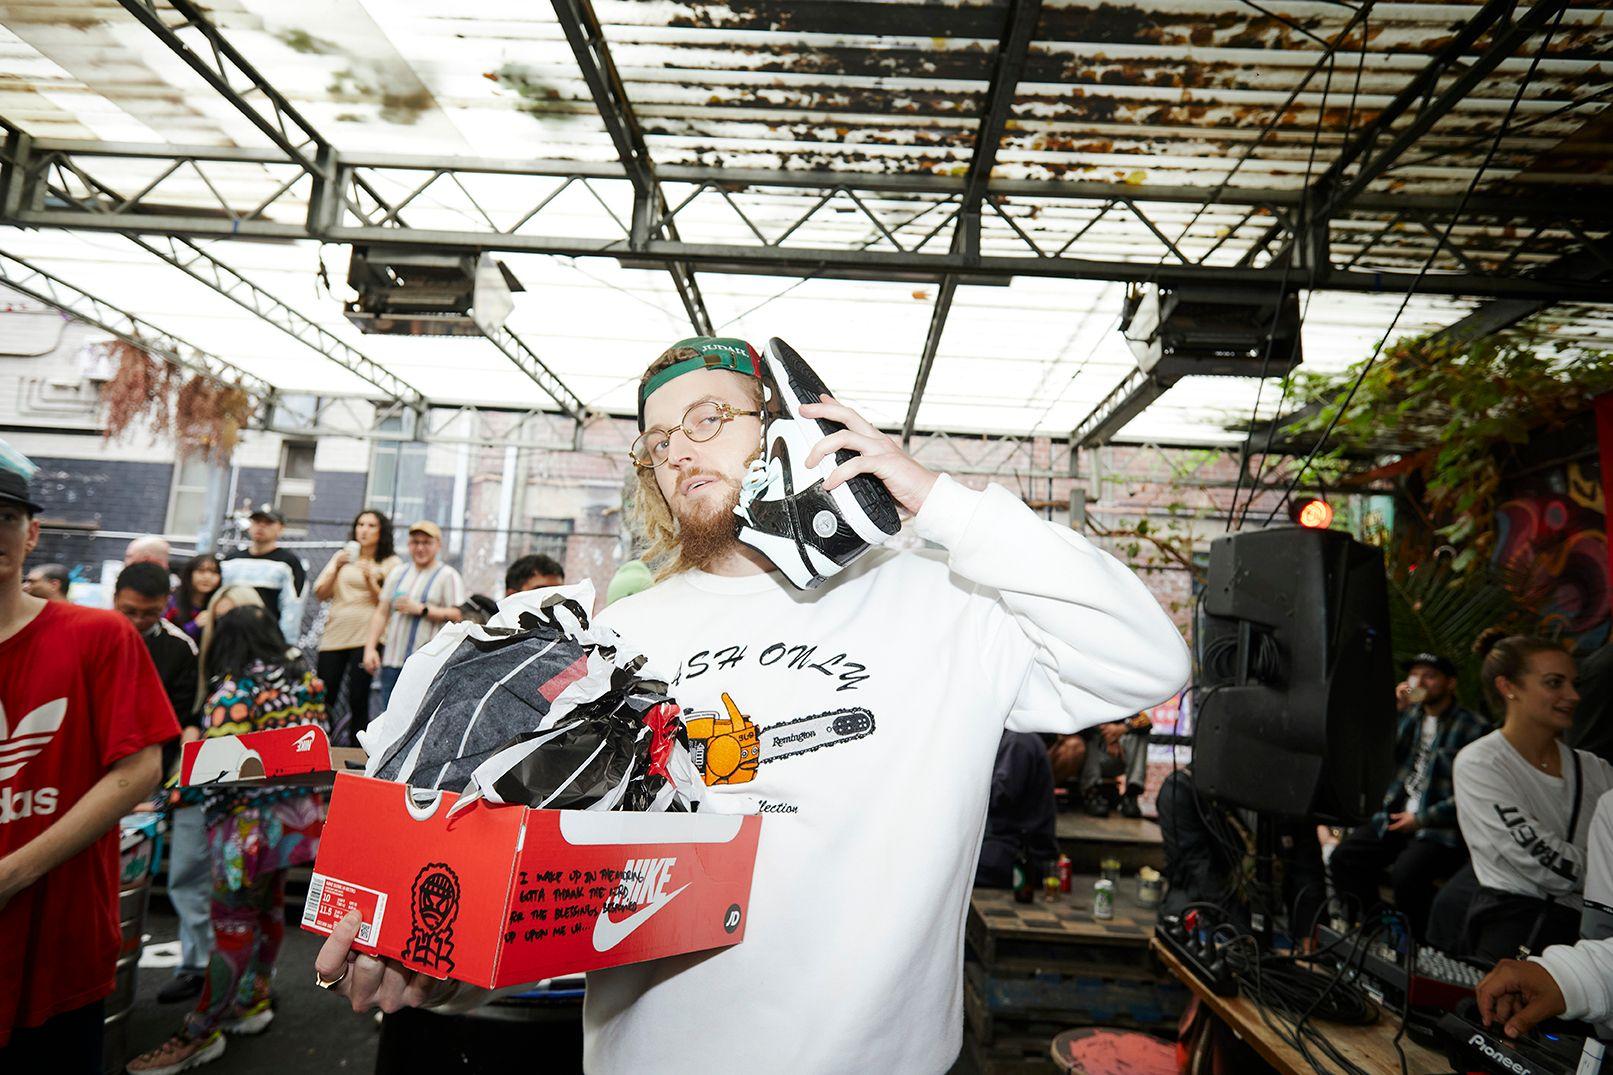 jd sports shockdrops event photos sneaker freaker